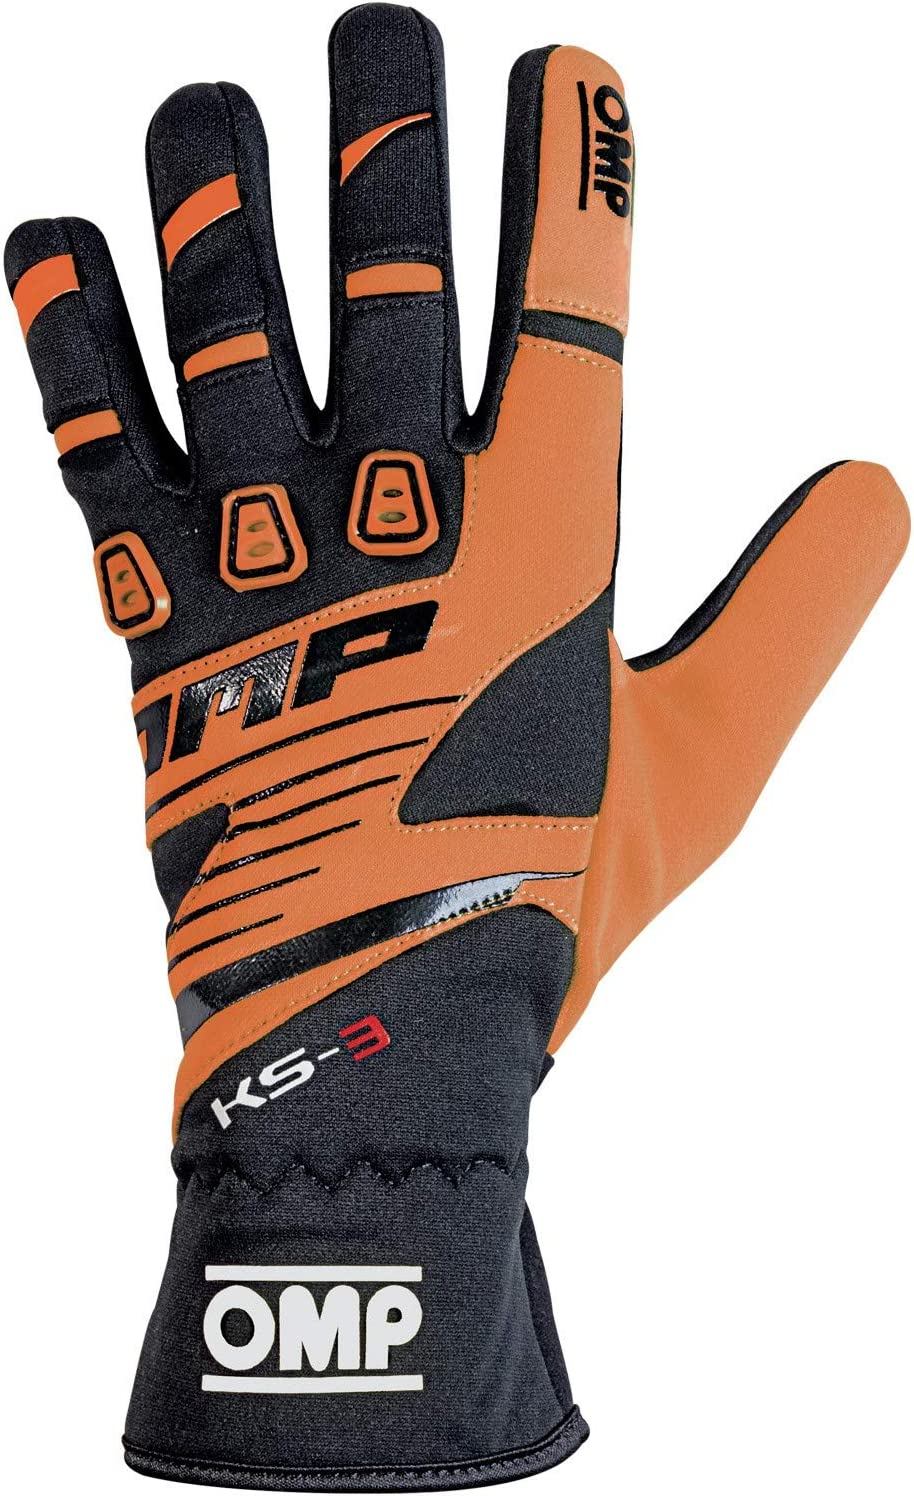 OMP KS-3 Karting Gloves Size XX-Small, Black//Orange